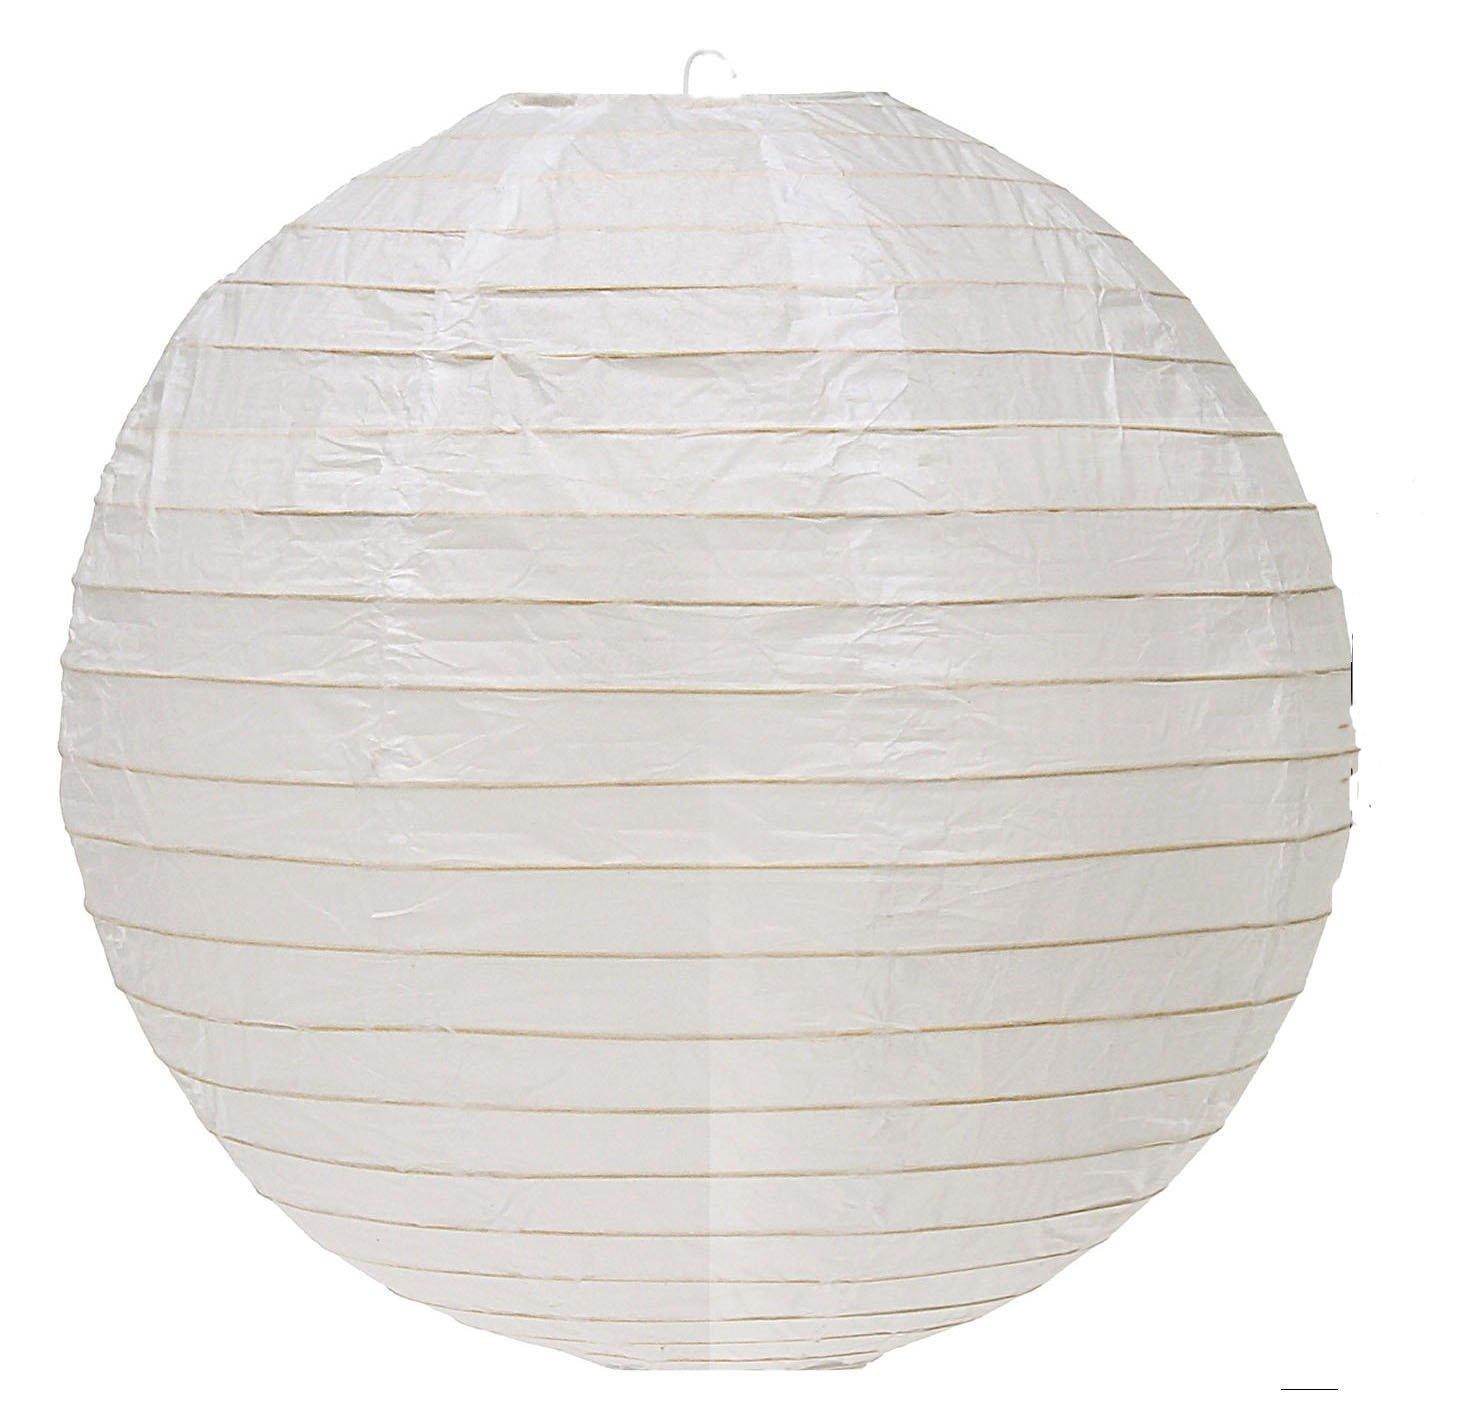 2X Generic GEN75465 12-Inch Paper Lantern Lamp Shades, White, 12-Pack